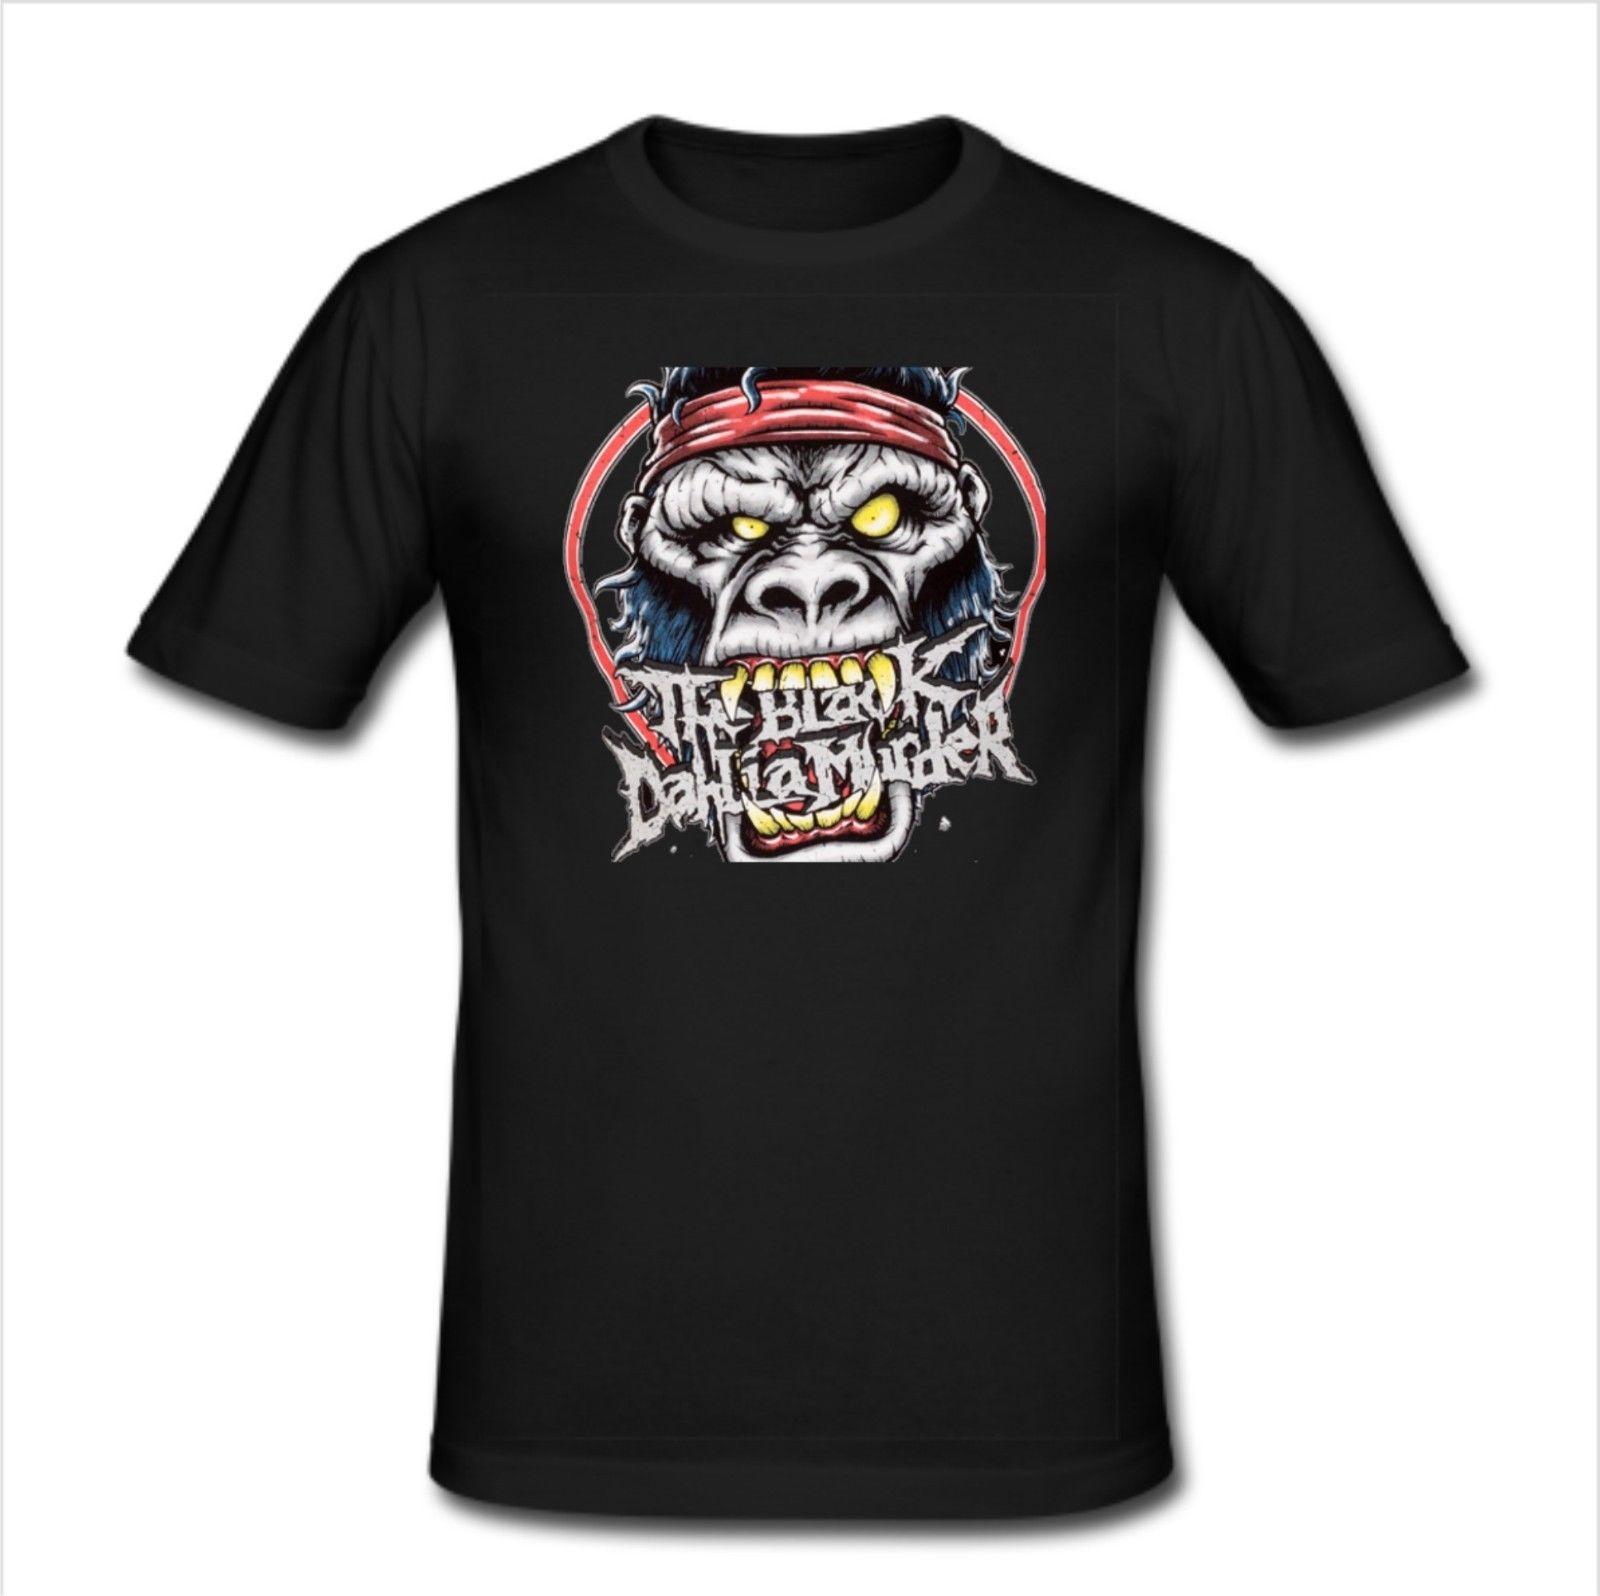 Mens Slim Fit T Shirt Size S-3XL - The Black Dahlia Murder Metal Band Fashion Short Sleeve Sale 100 % Cotton O-Neck T-Shirt